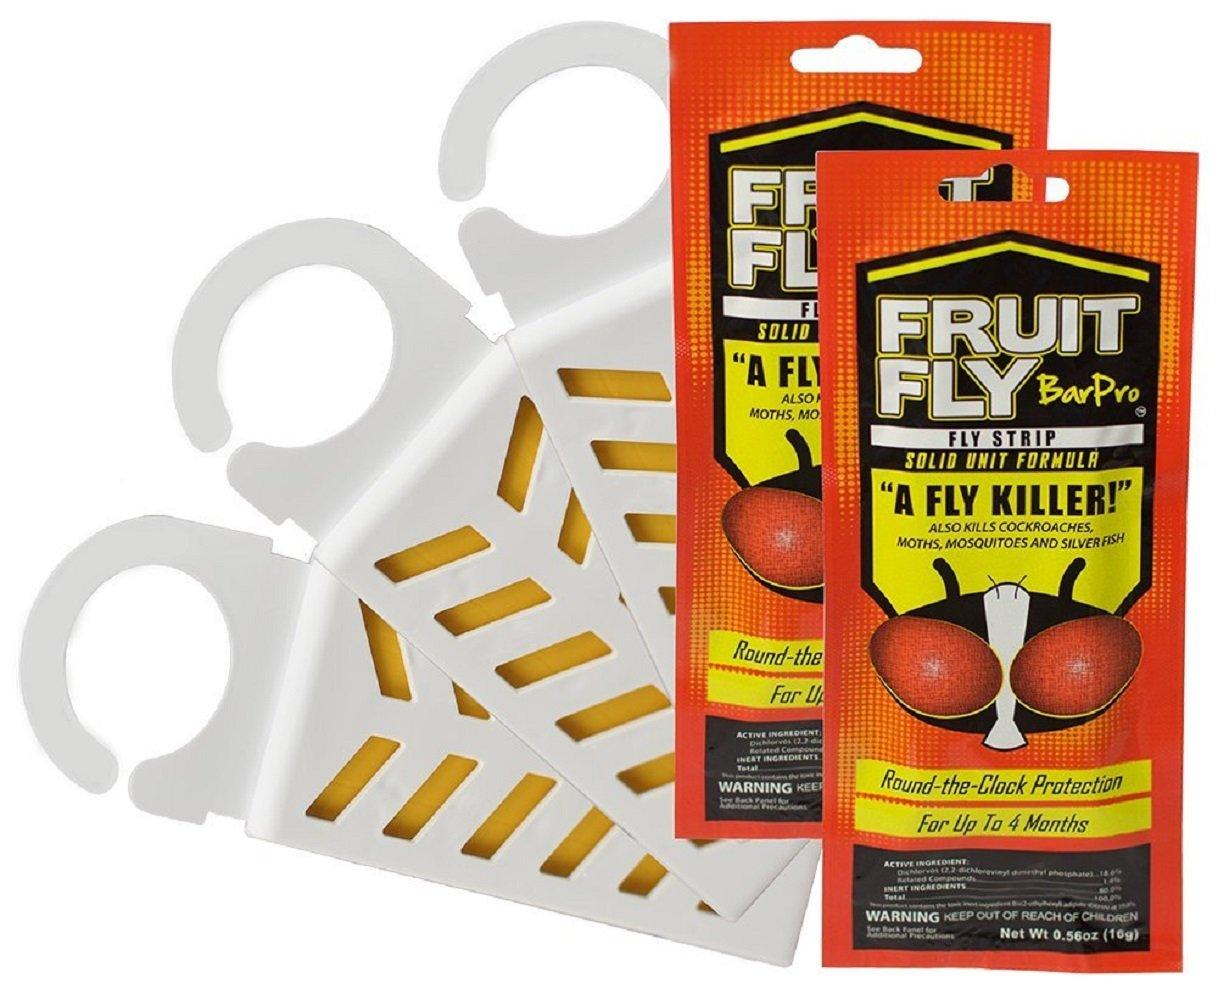 Fruit Fly BarPro Fly Control Strip - Net Wt 0.56 oz